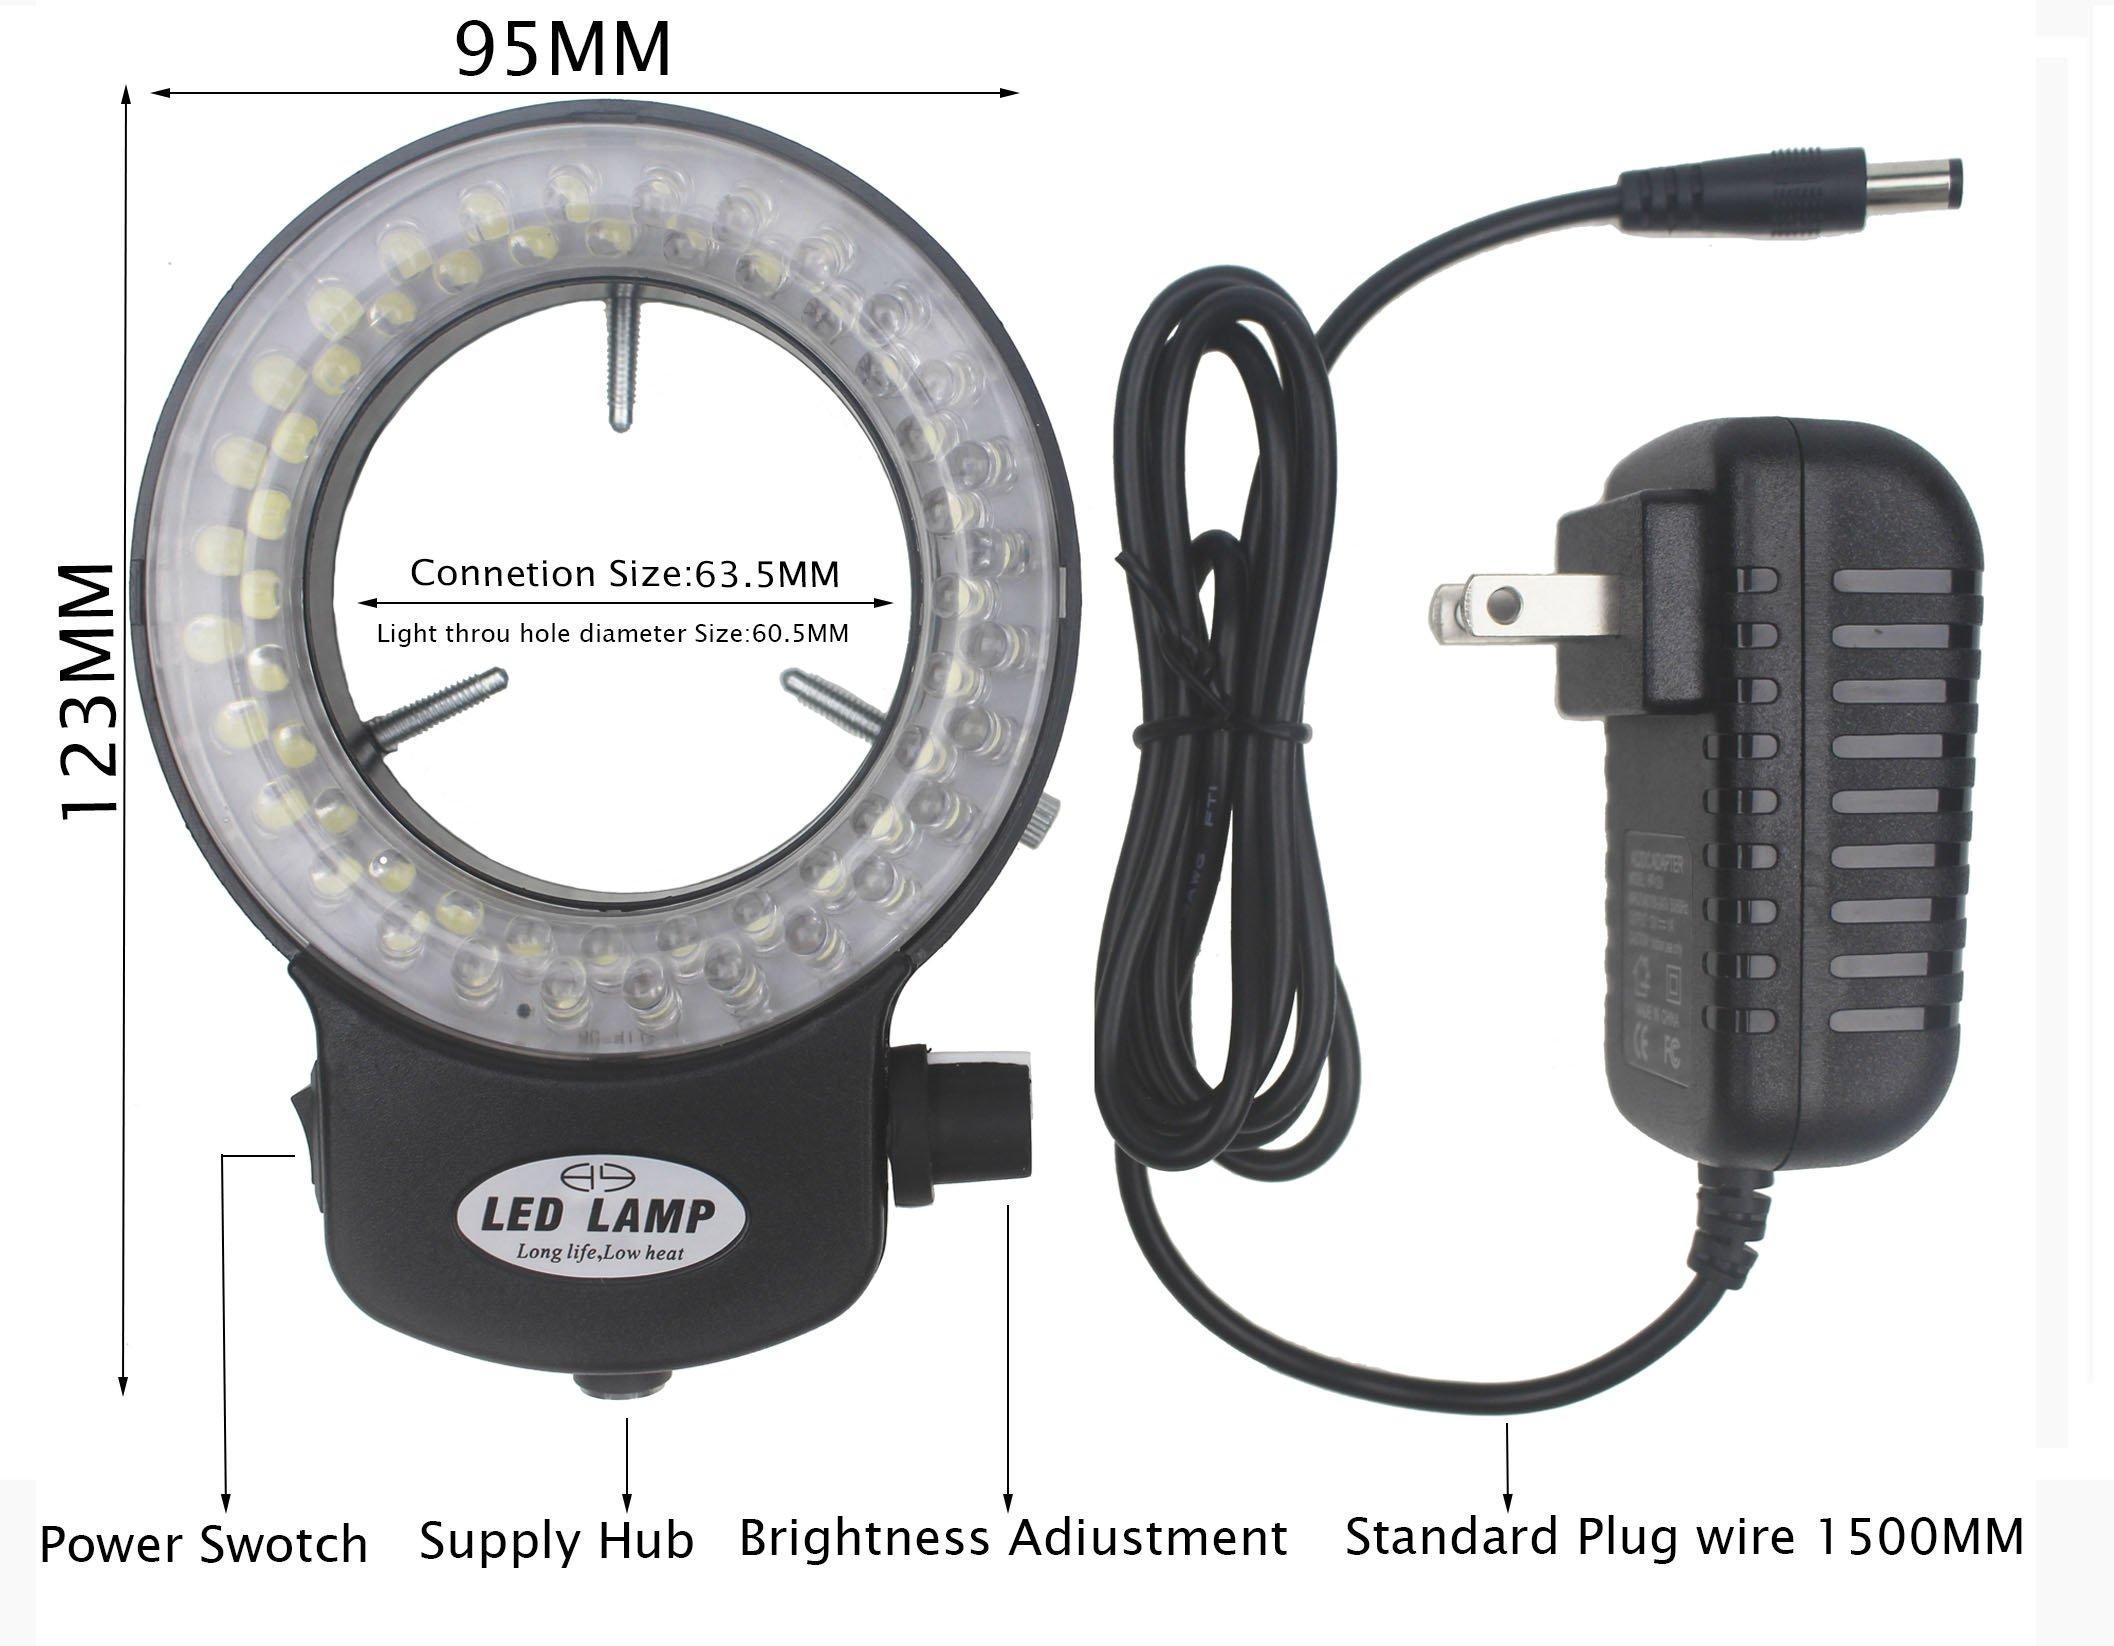 Bikani LED- 56 –BK Adjustable LED Ring Light for Stereo Microscope,with Power Adapter (Black) by BIKANI (Image #2)